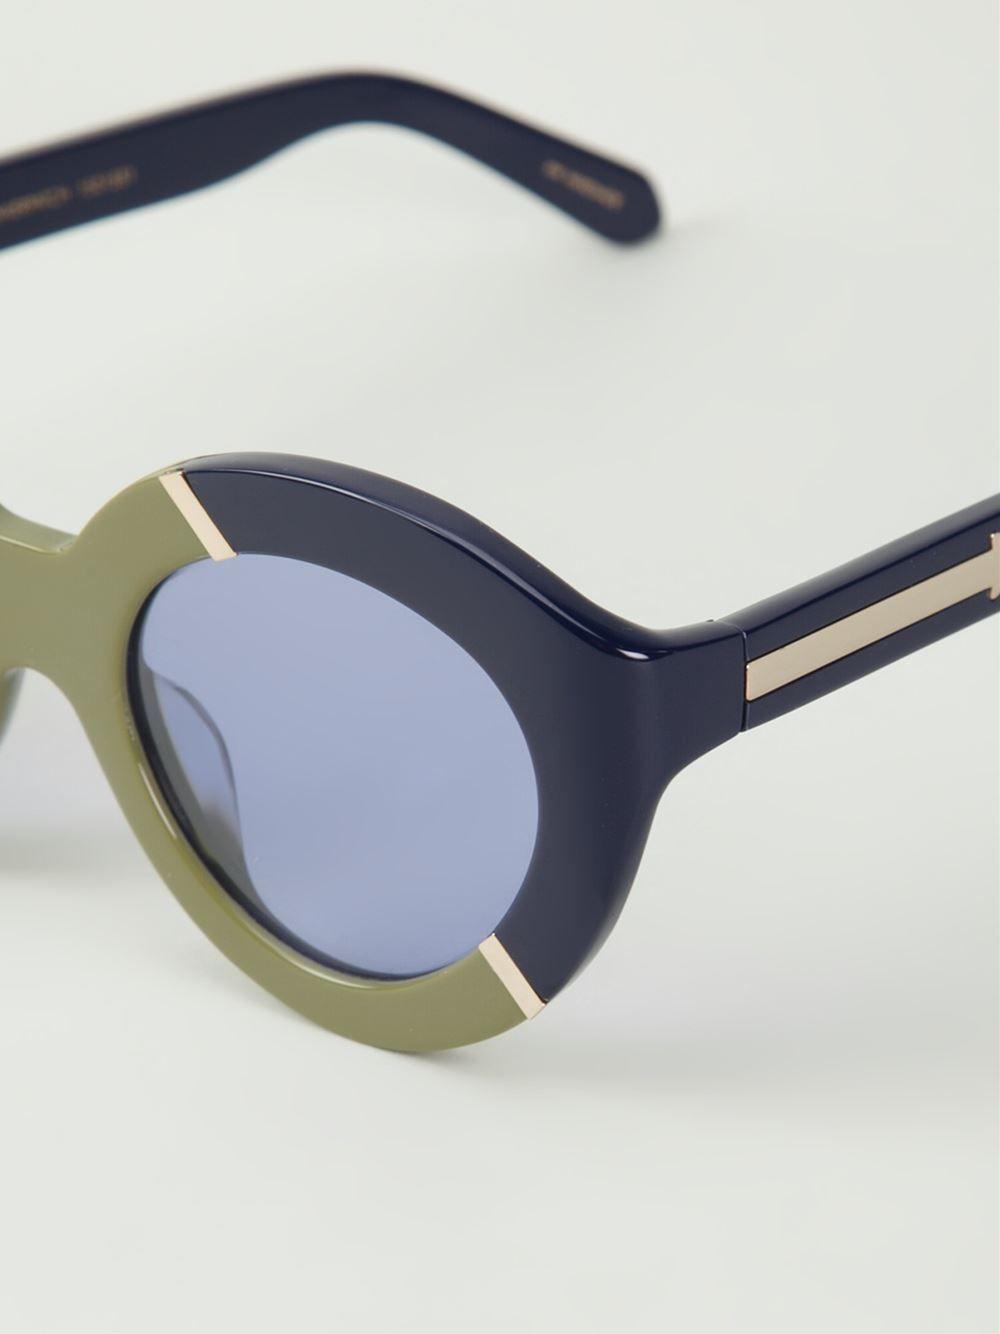 6620d5fa63 Shop KAREN WALKER EYEWEAR  Flower Patch  sunglasses from Farfetch ...